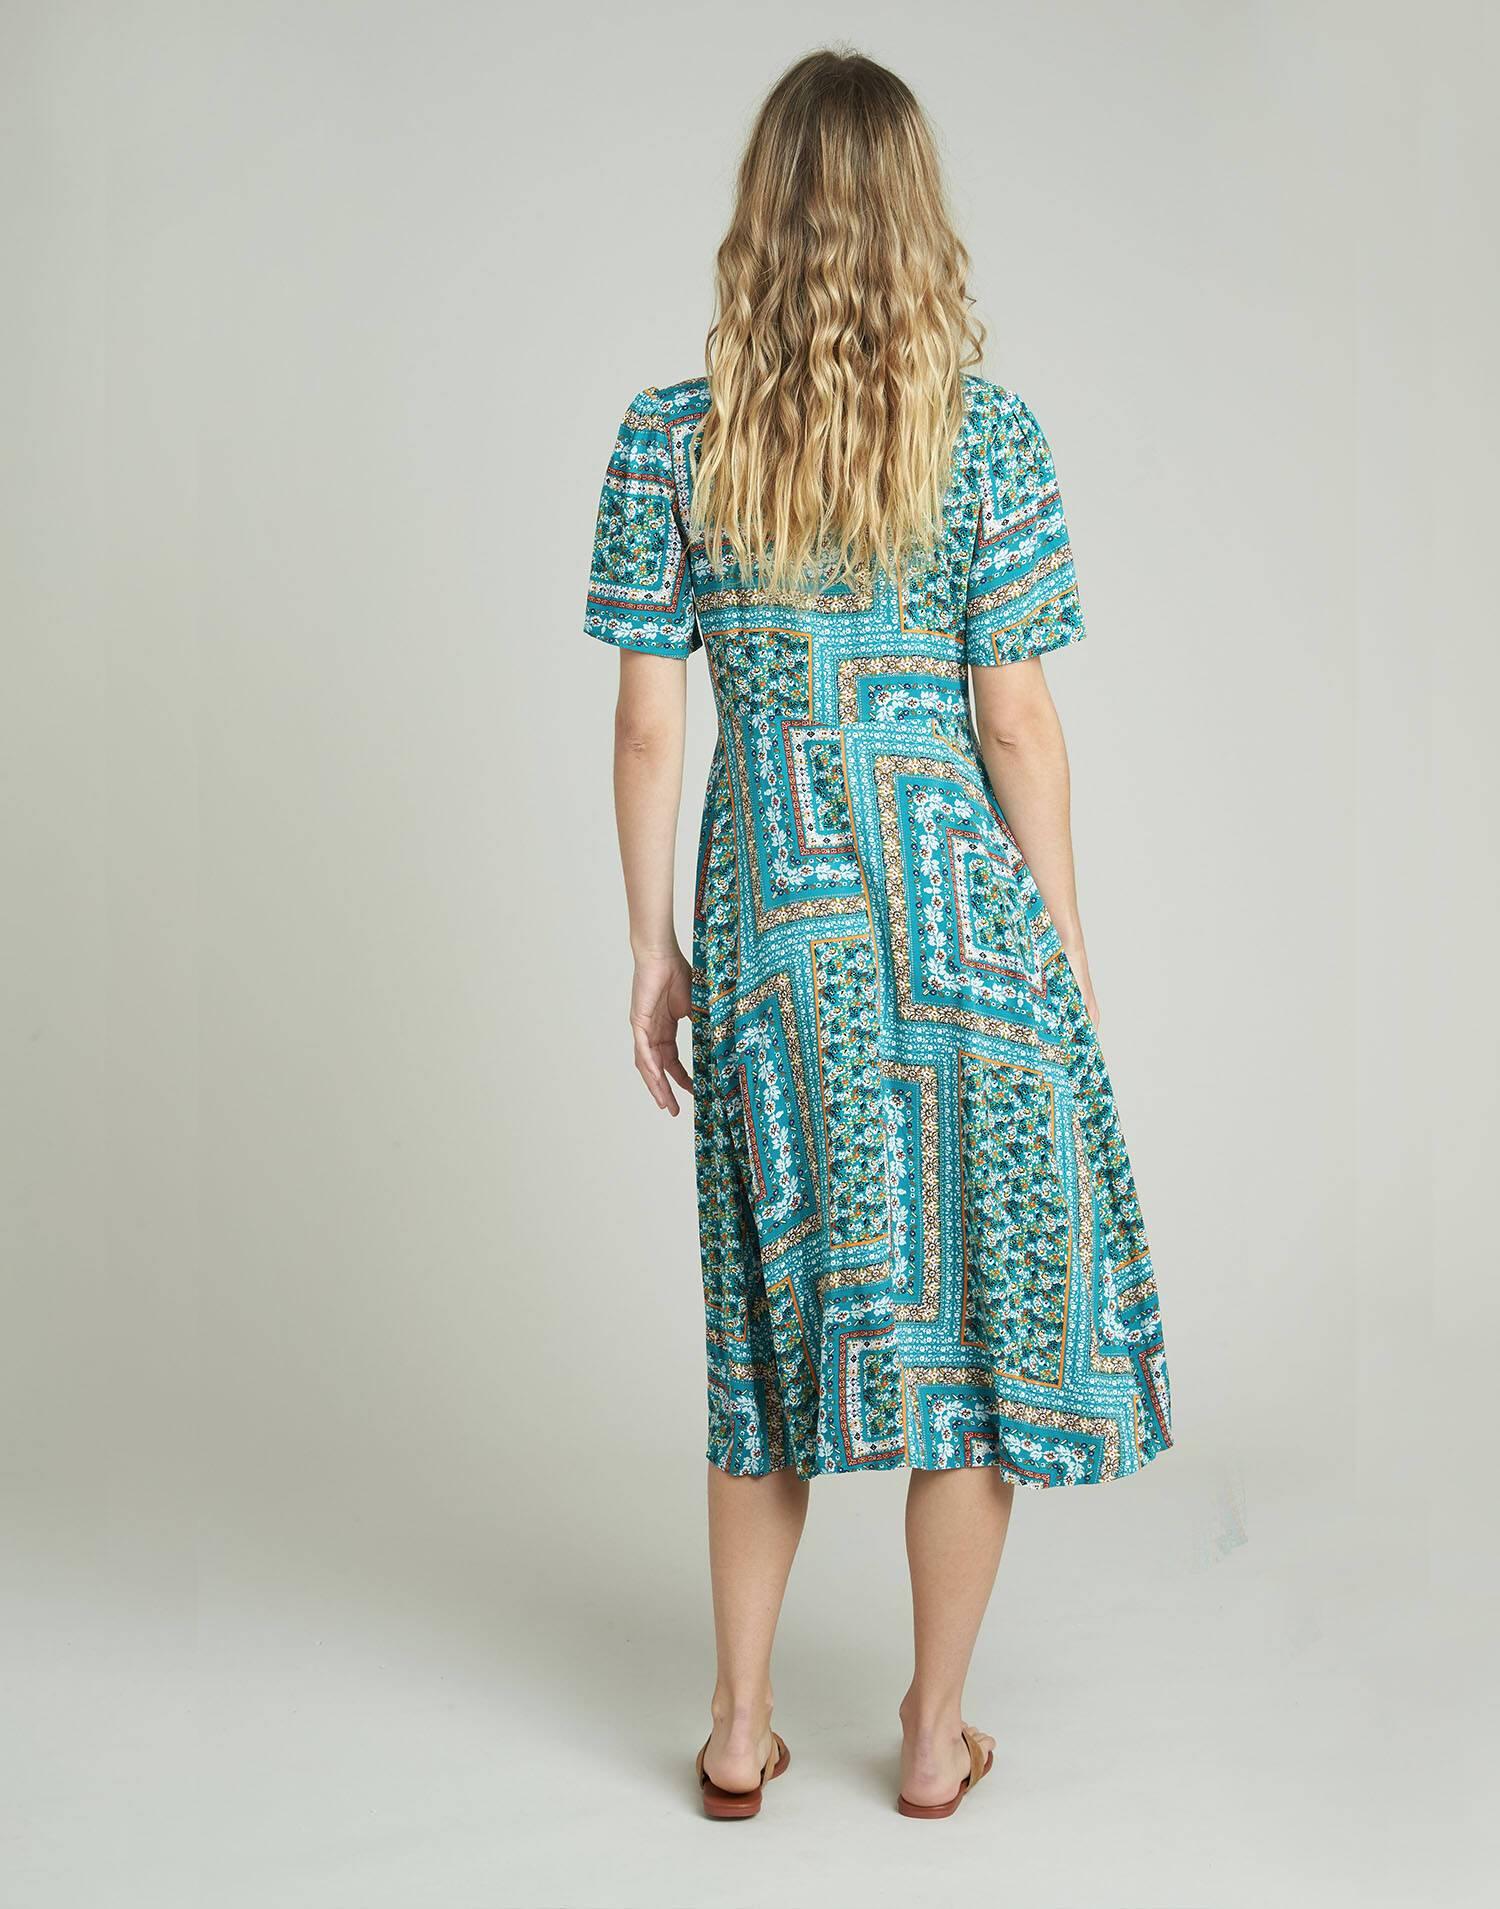 Vestido print patchwork